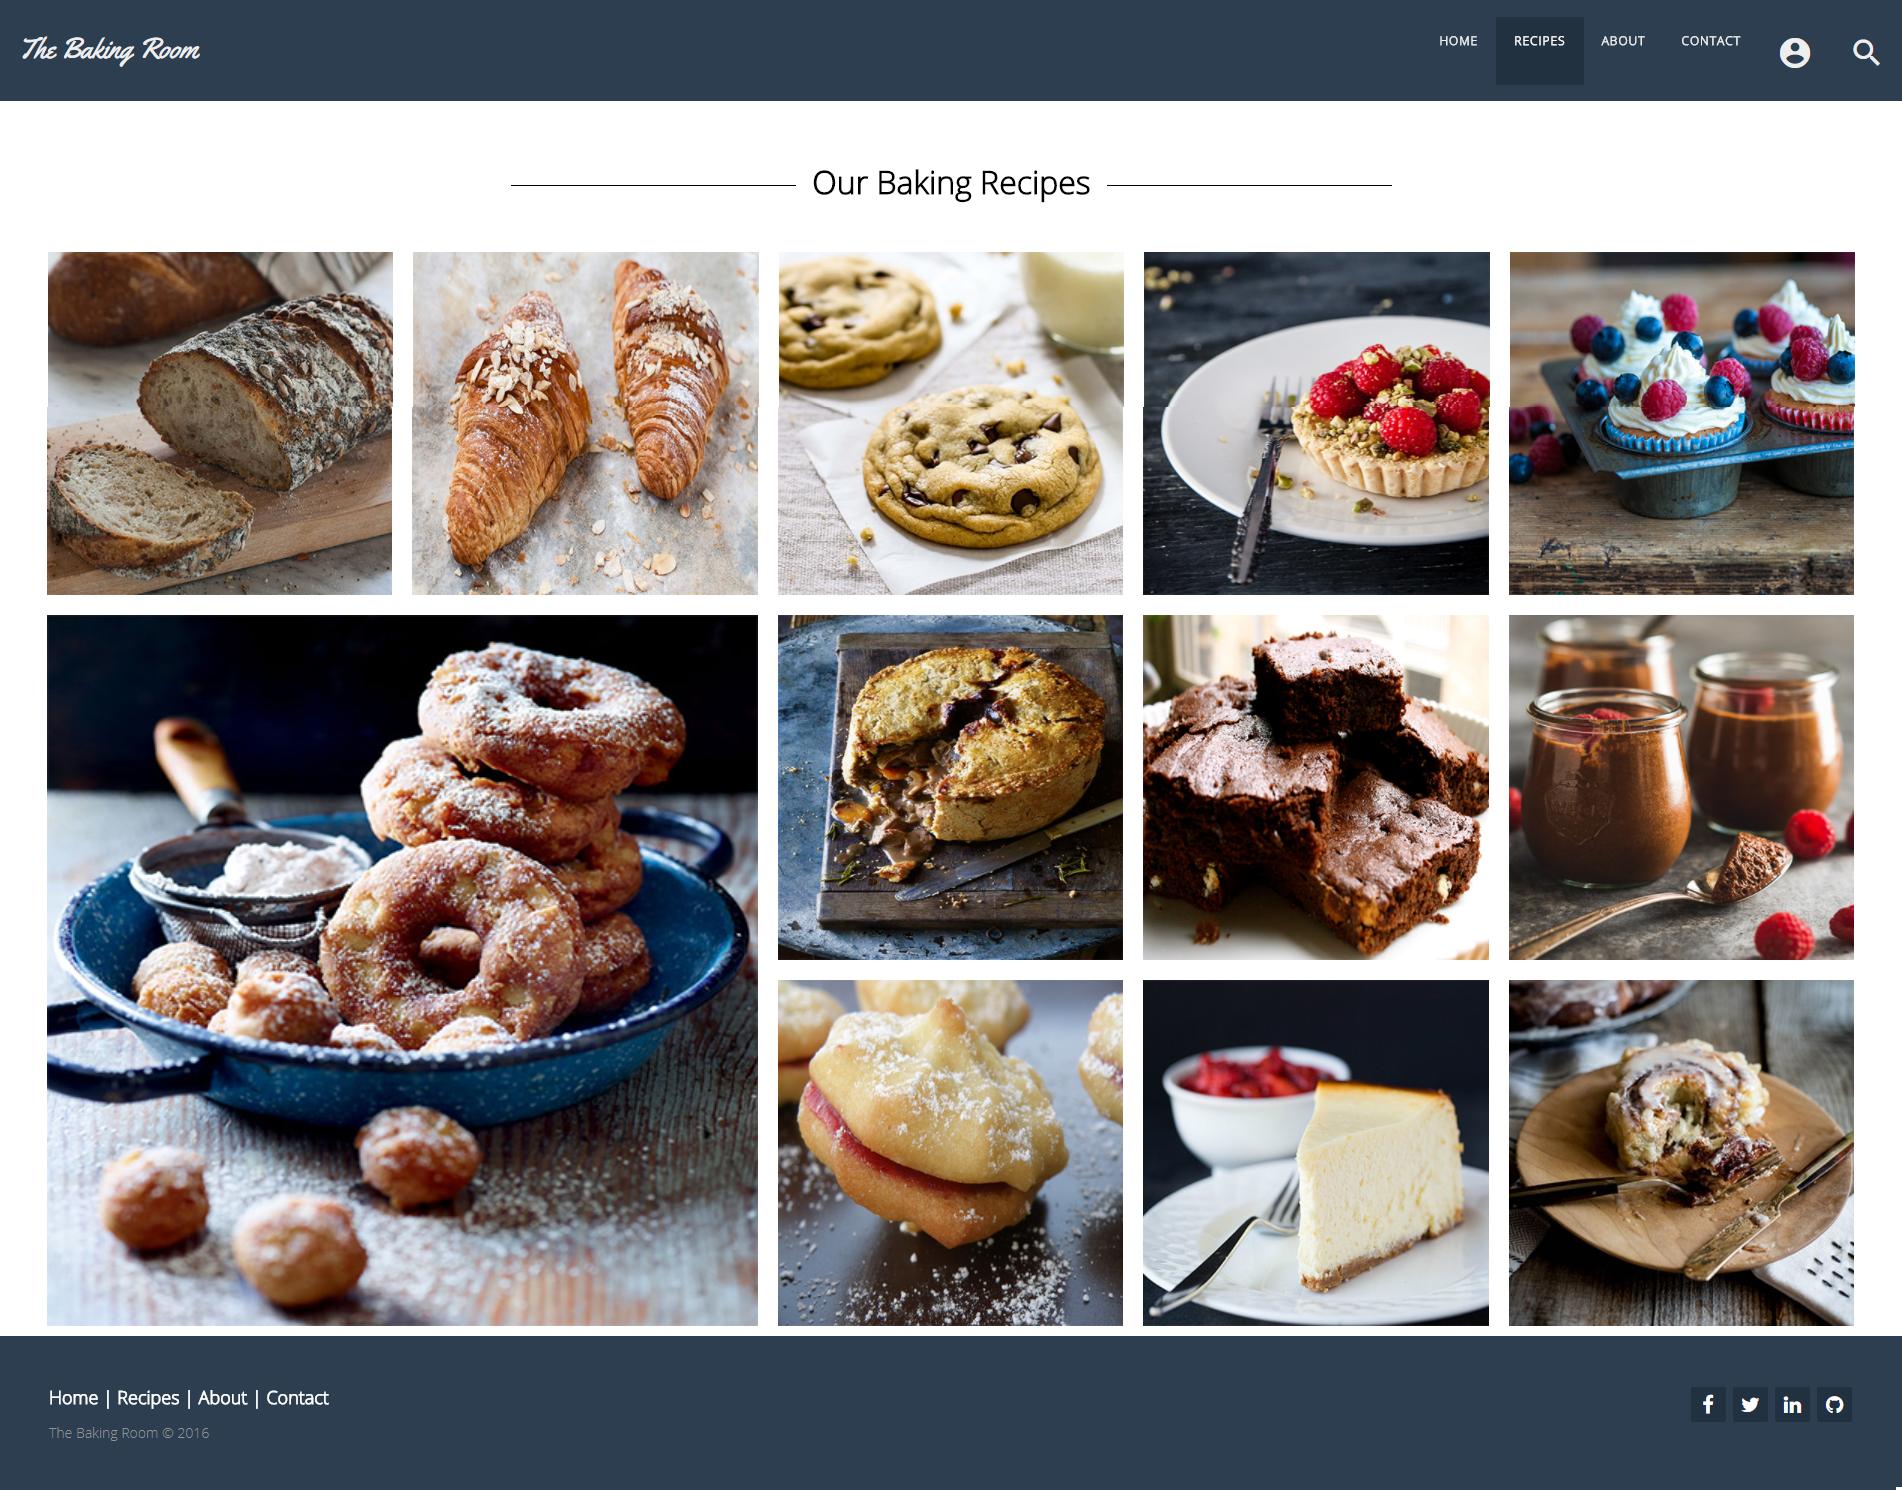 Baking-Room-Recipes.png